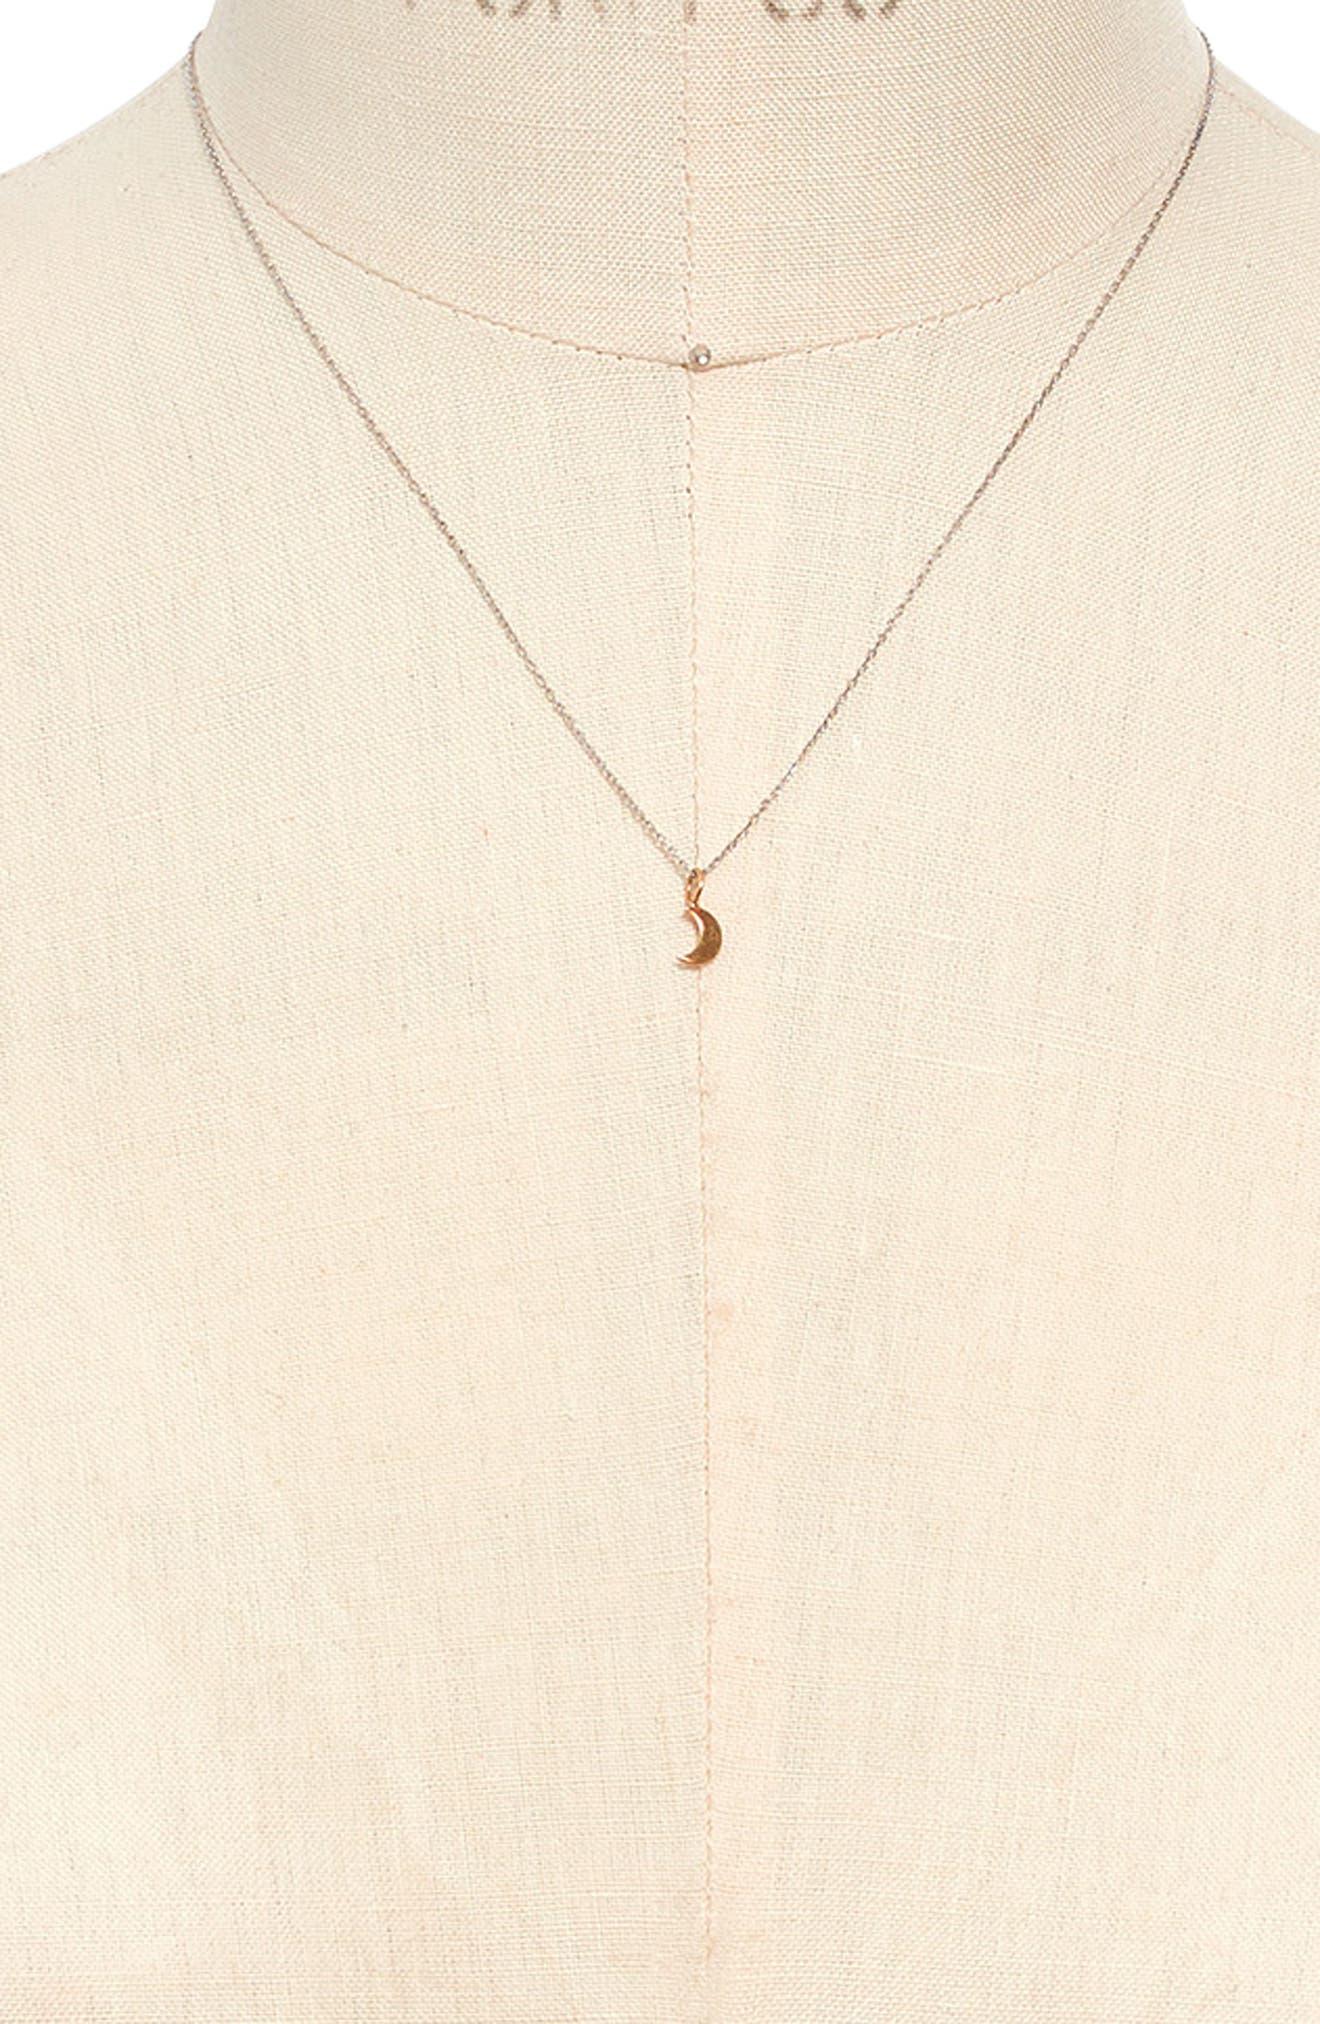 MADEWELL, Vermeil Crescent Moon Charm Necklace, Alternate thumbnail 2, color, VERMEIL